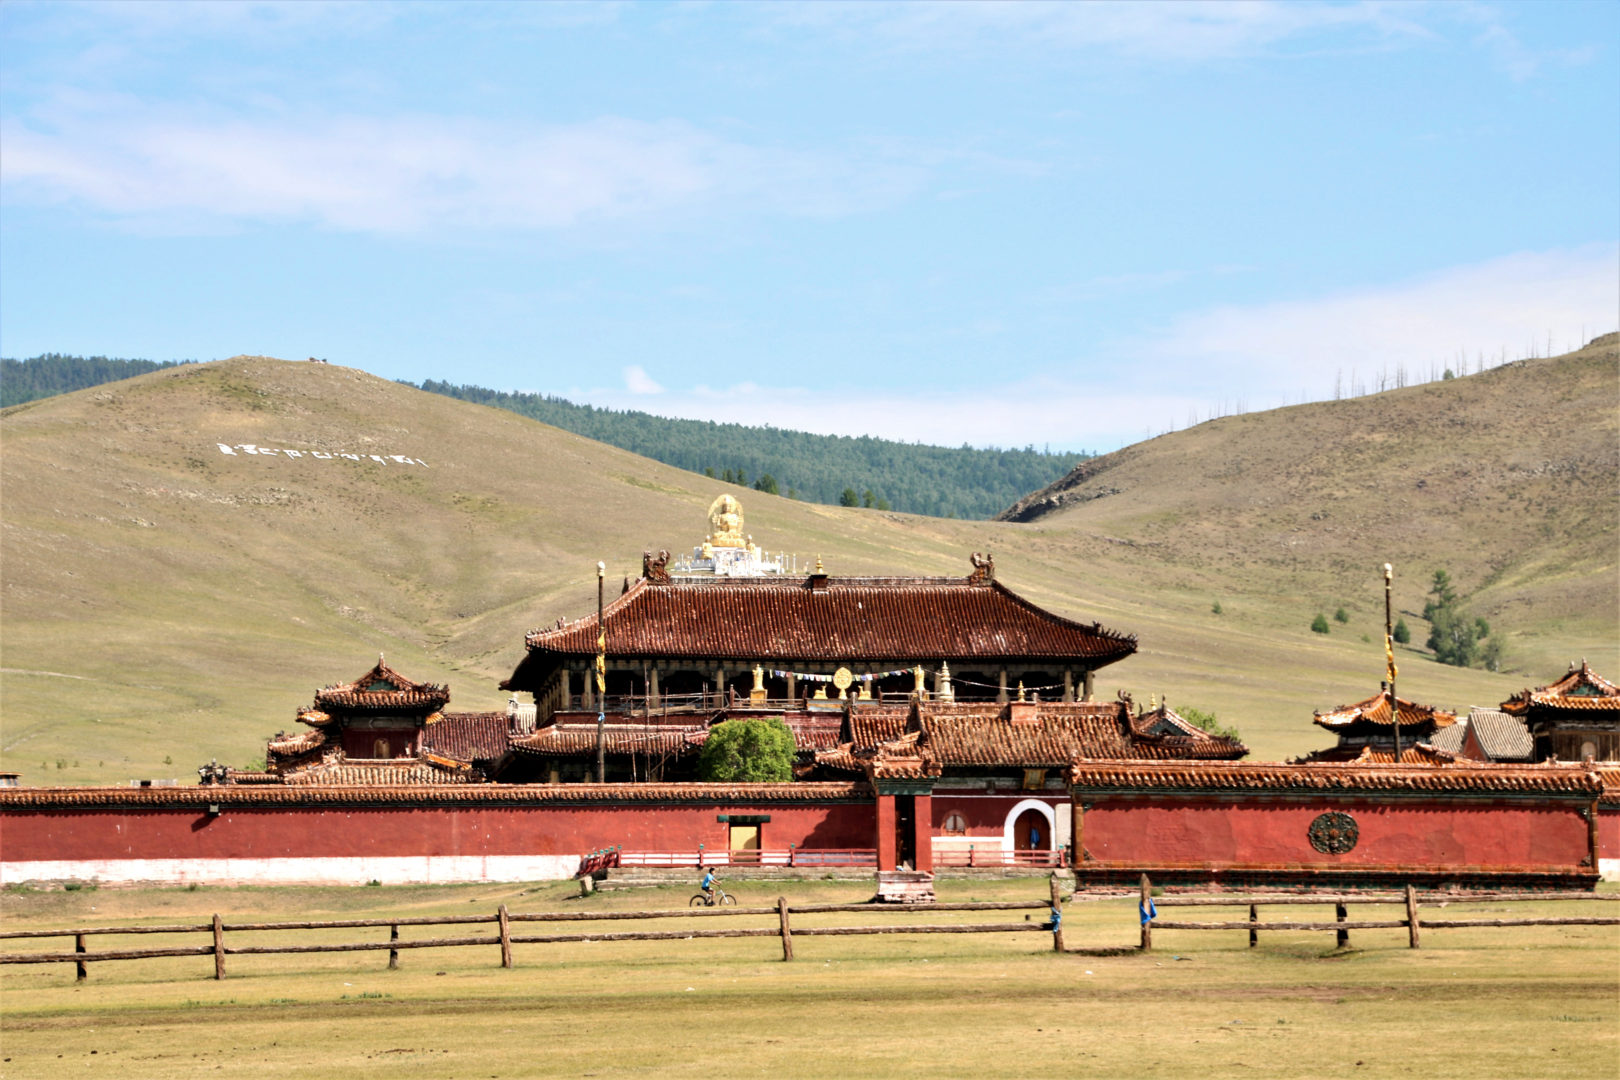 Kloster Amarbayasgalant